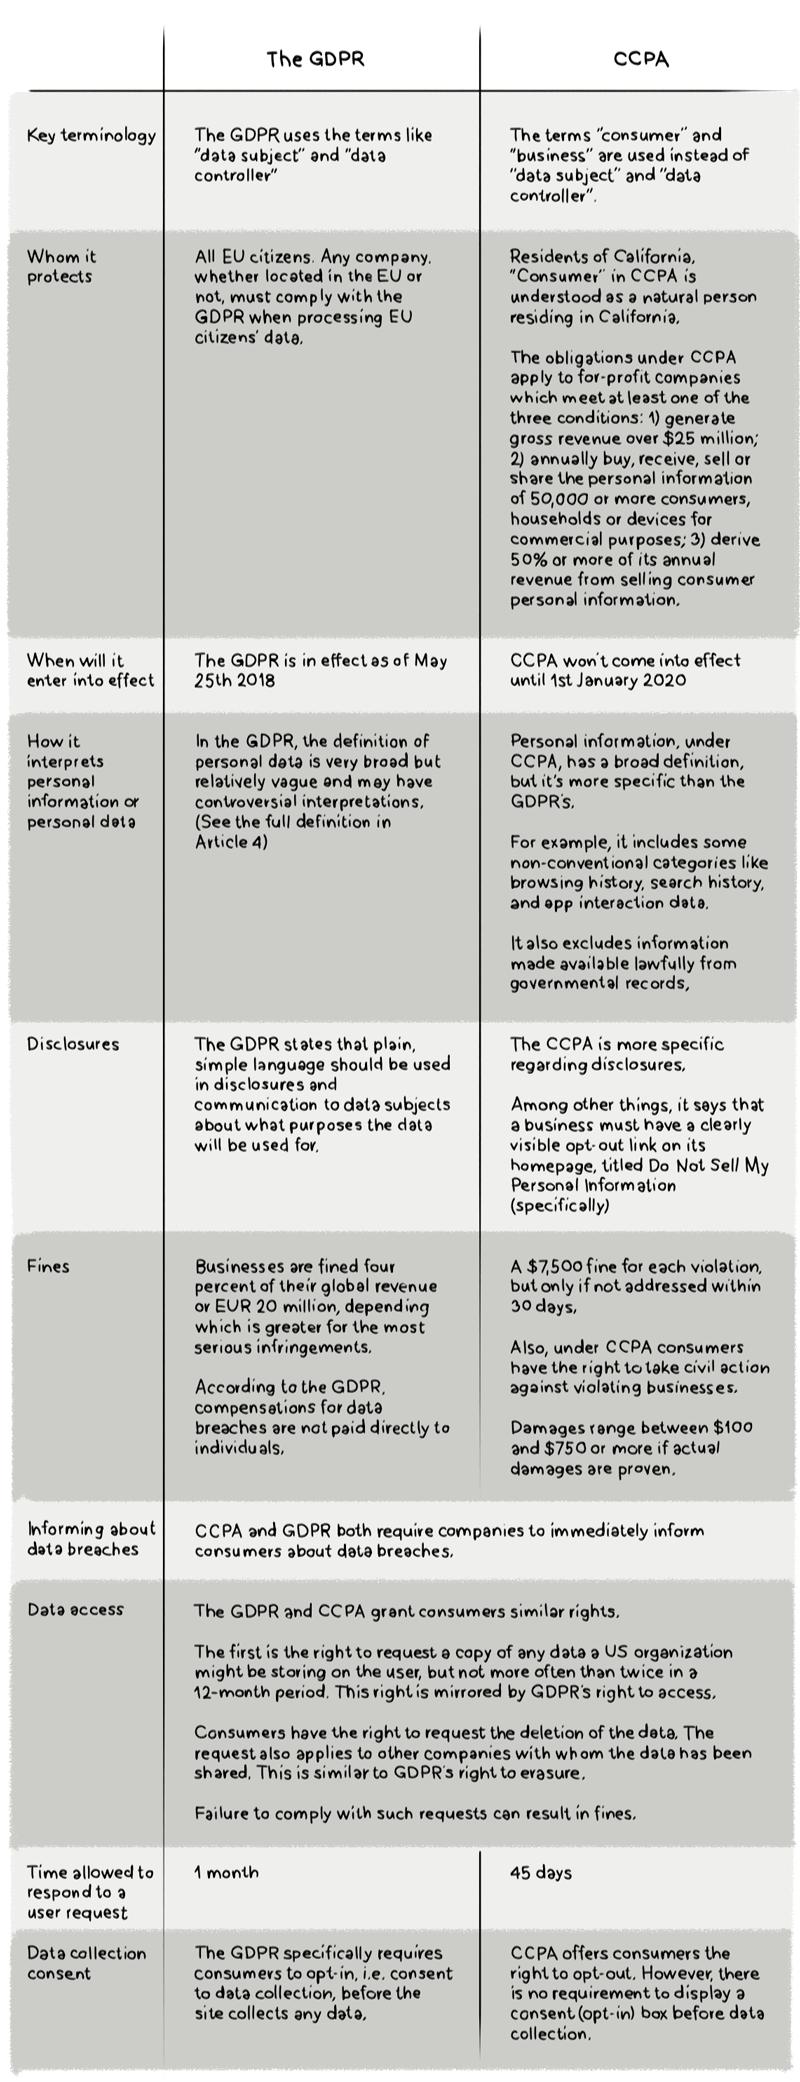 CCPA GDPR TABLE